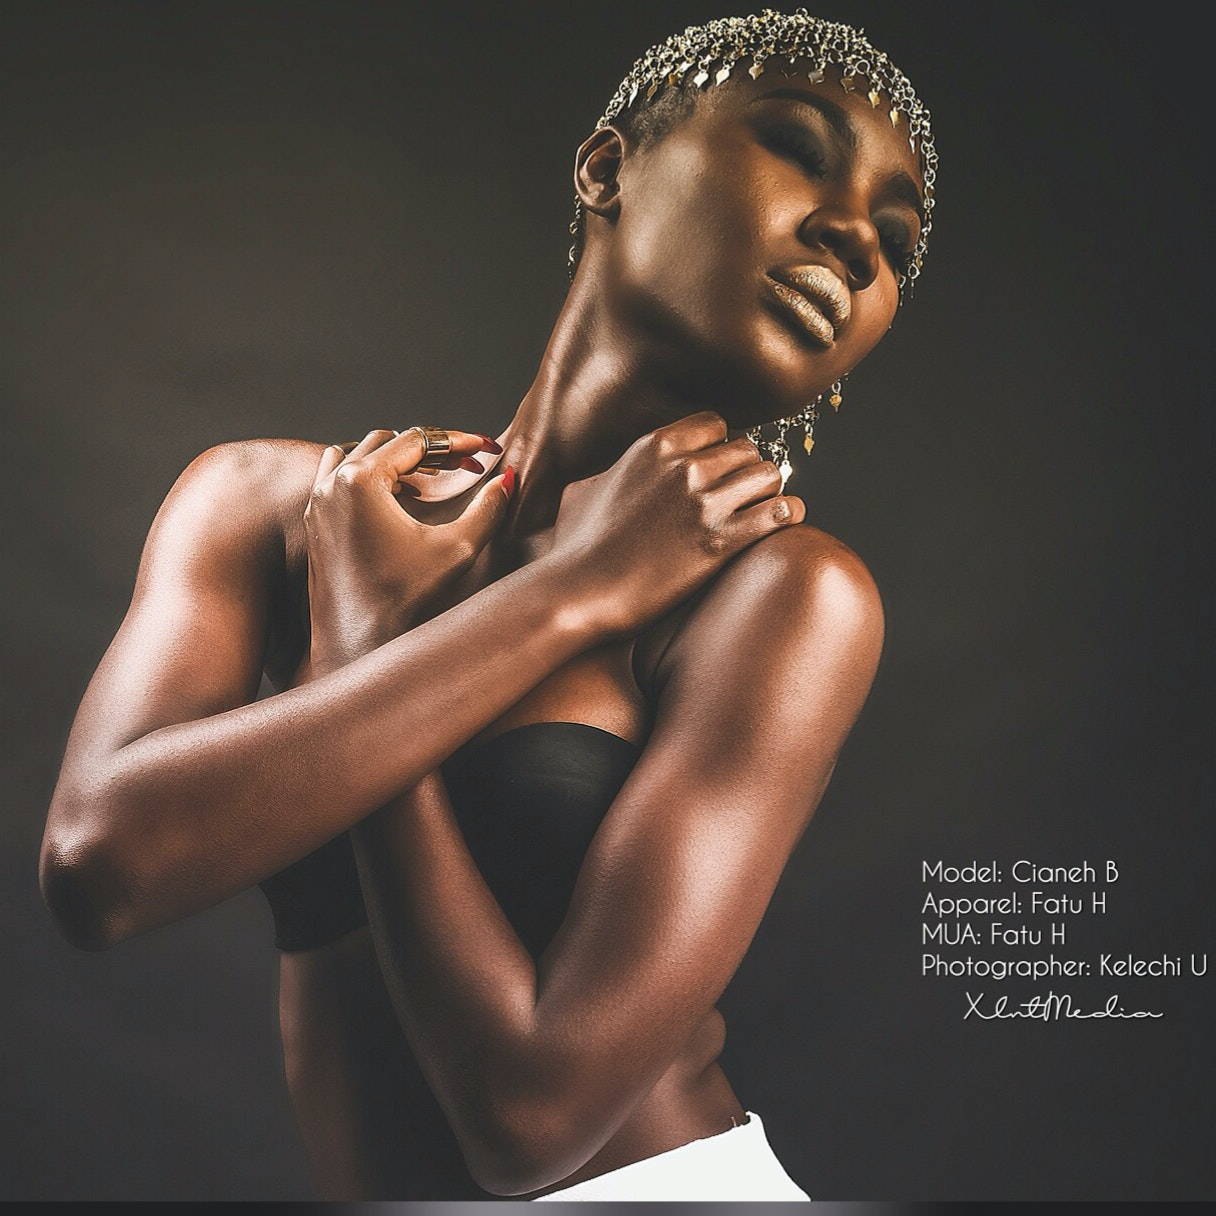 ciannehb's Model portfolio